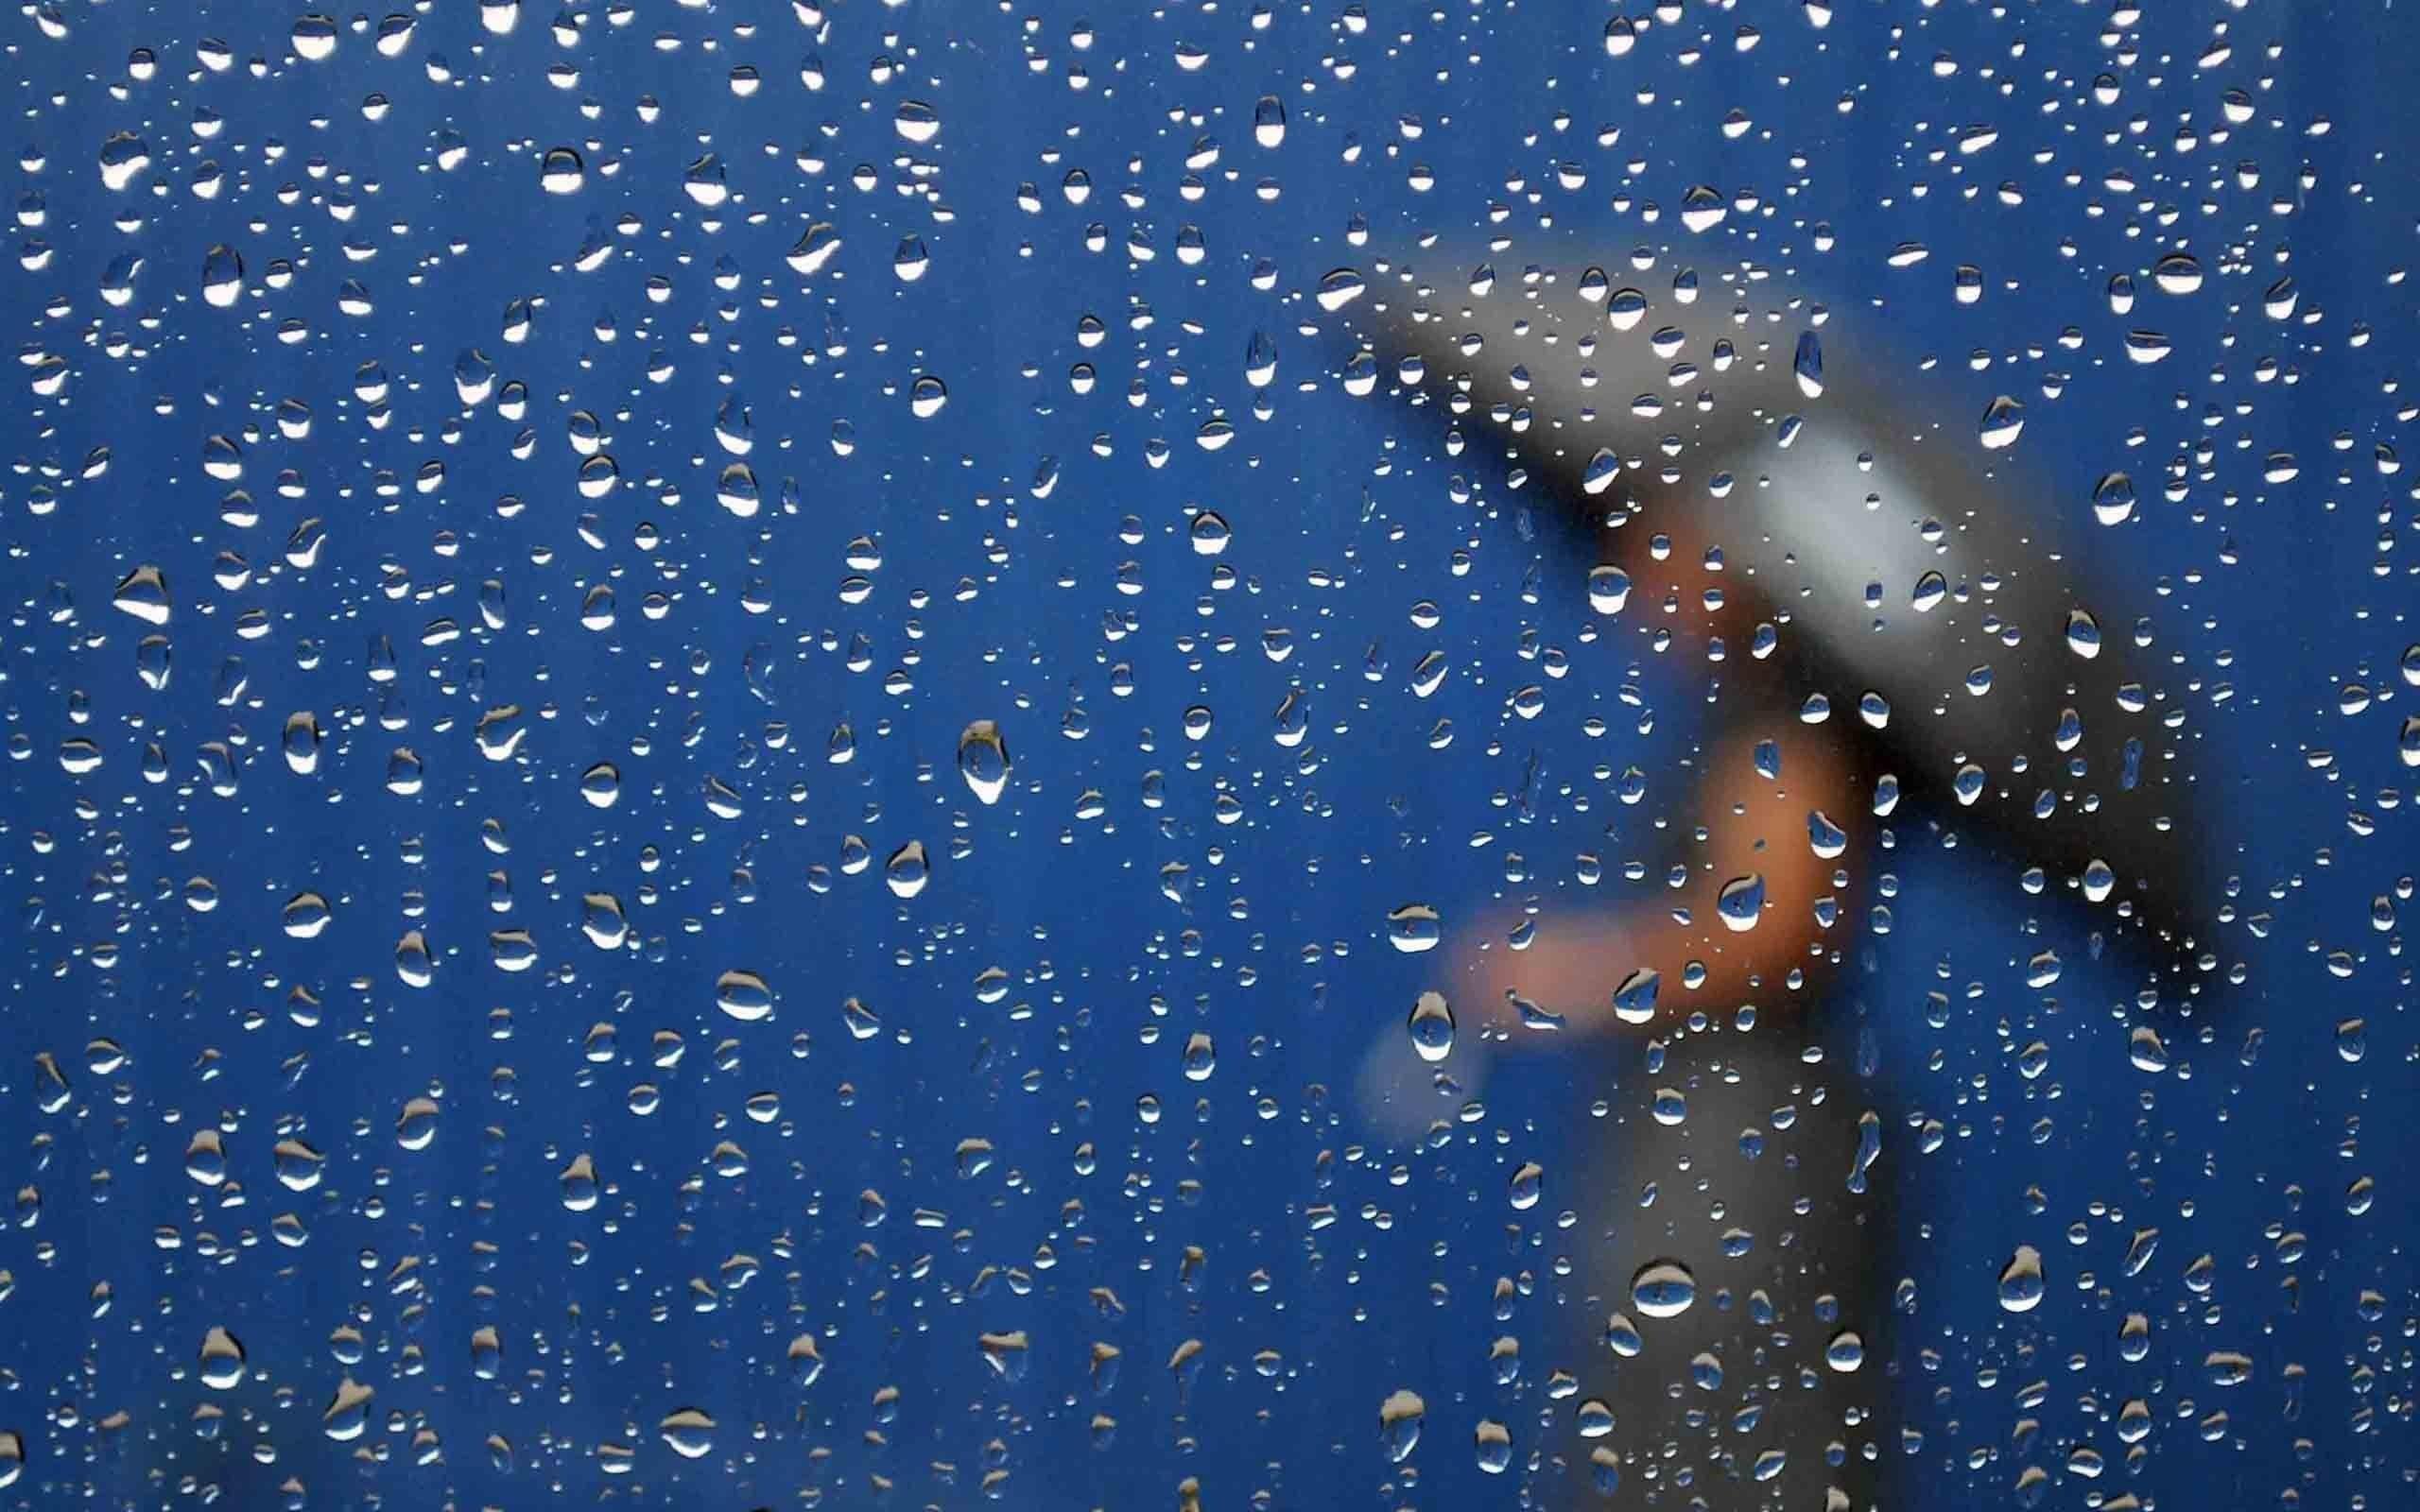 Rain Drops Wallpapers HD Wallpaper  Background ID